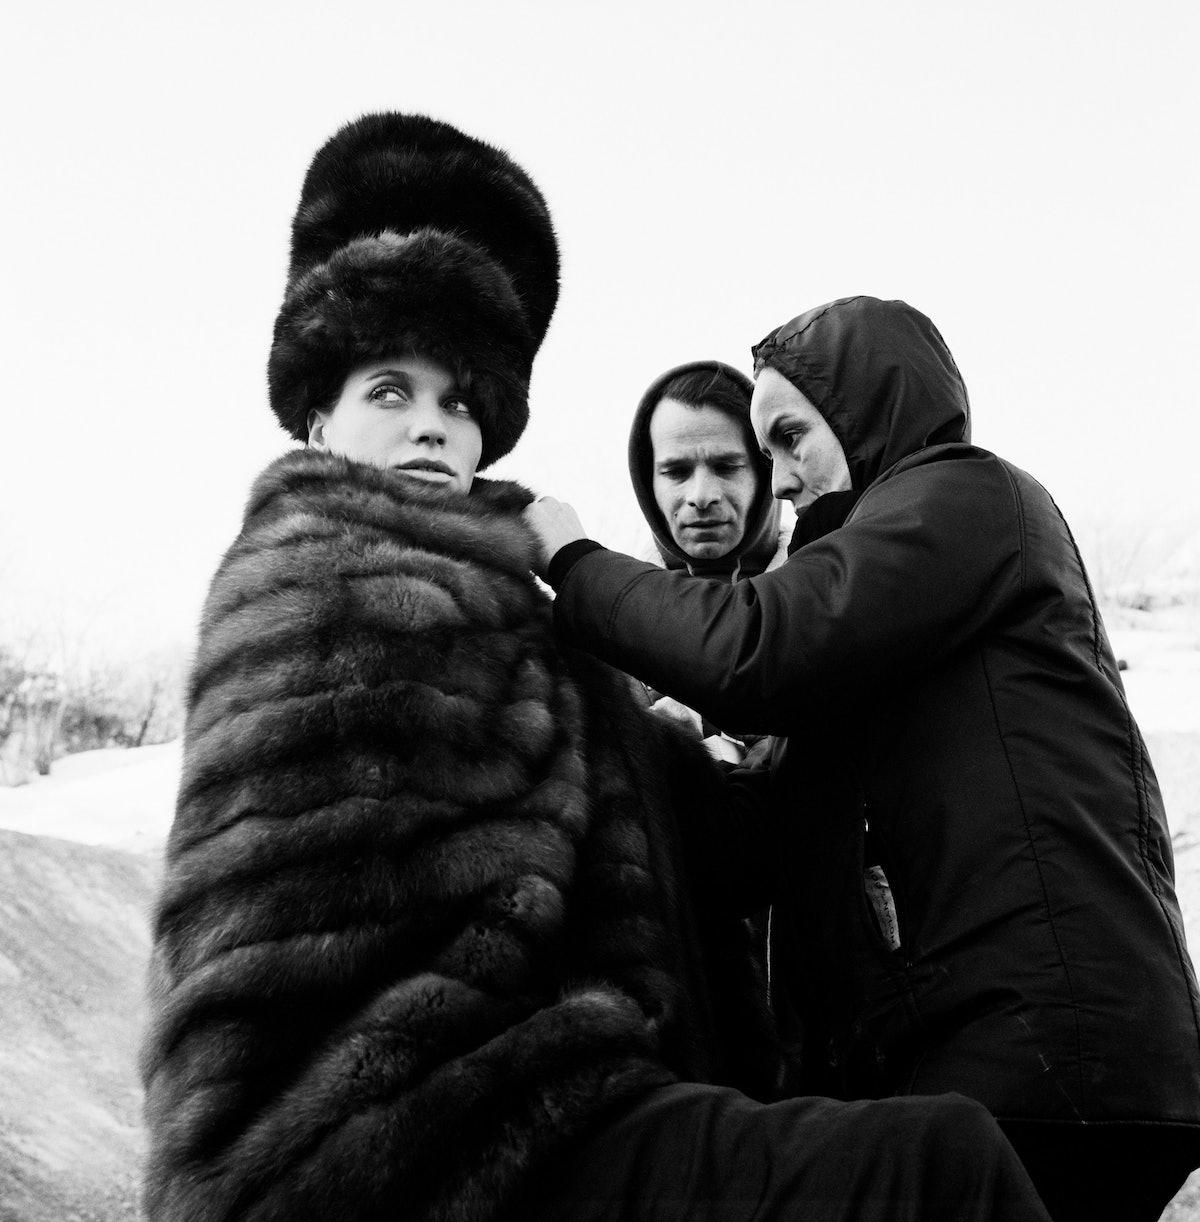 Veruschka+Ara Gallant+Polly Mellen 1966©Gideon Lewin.jpg